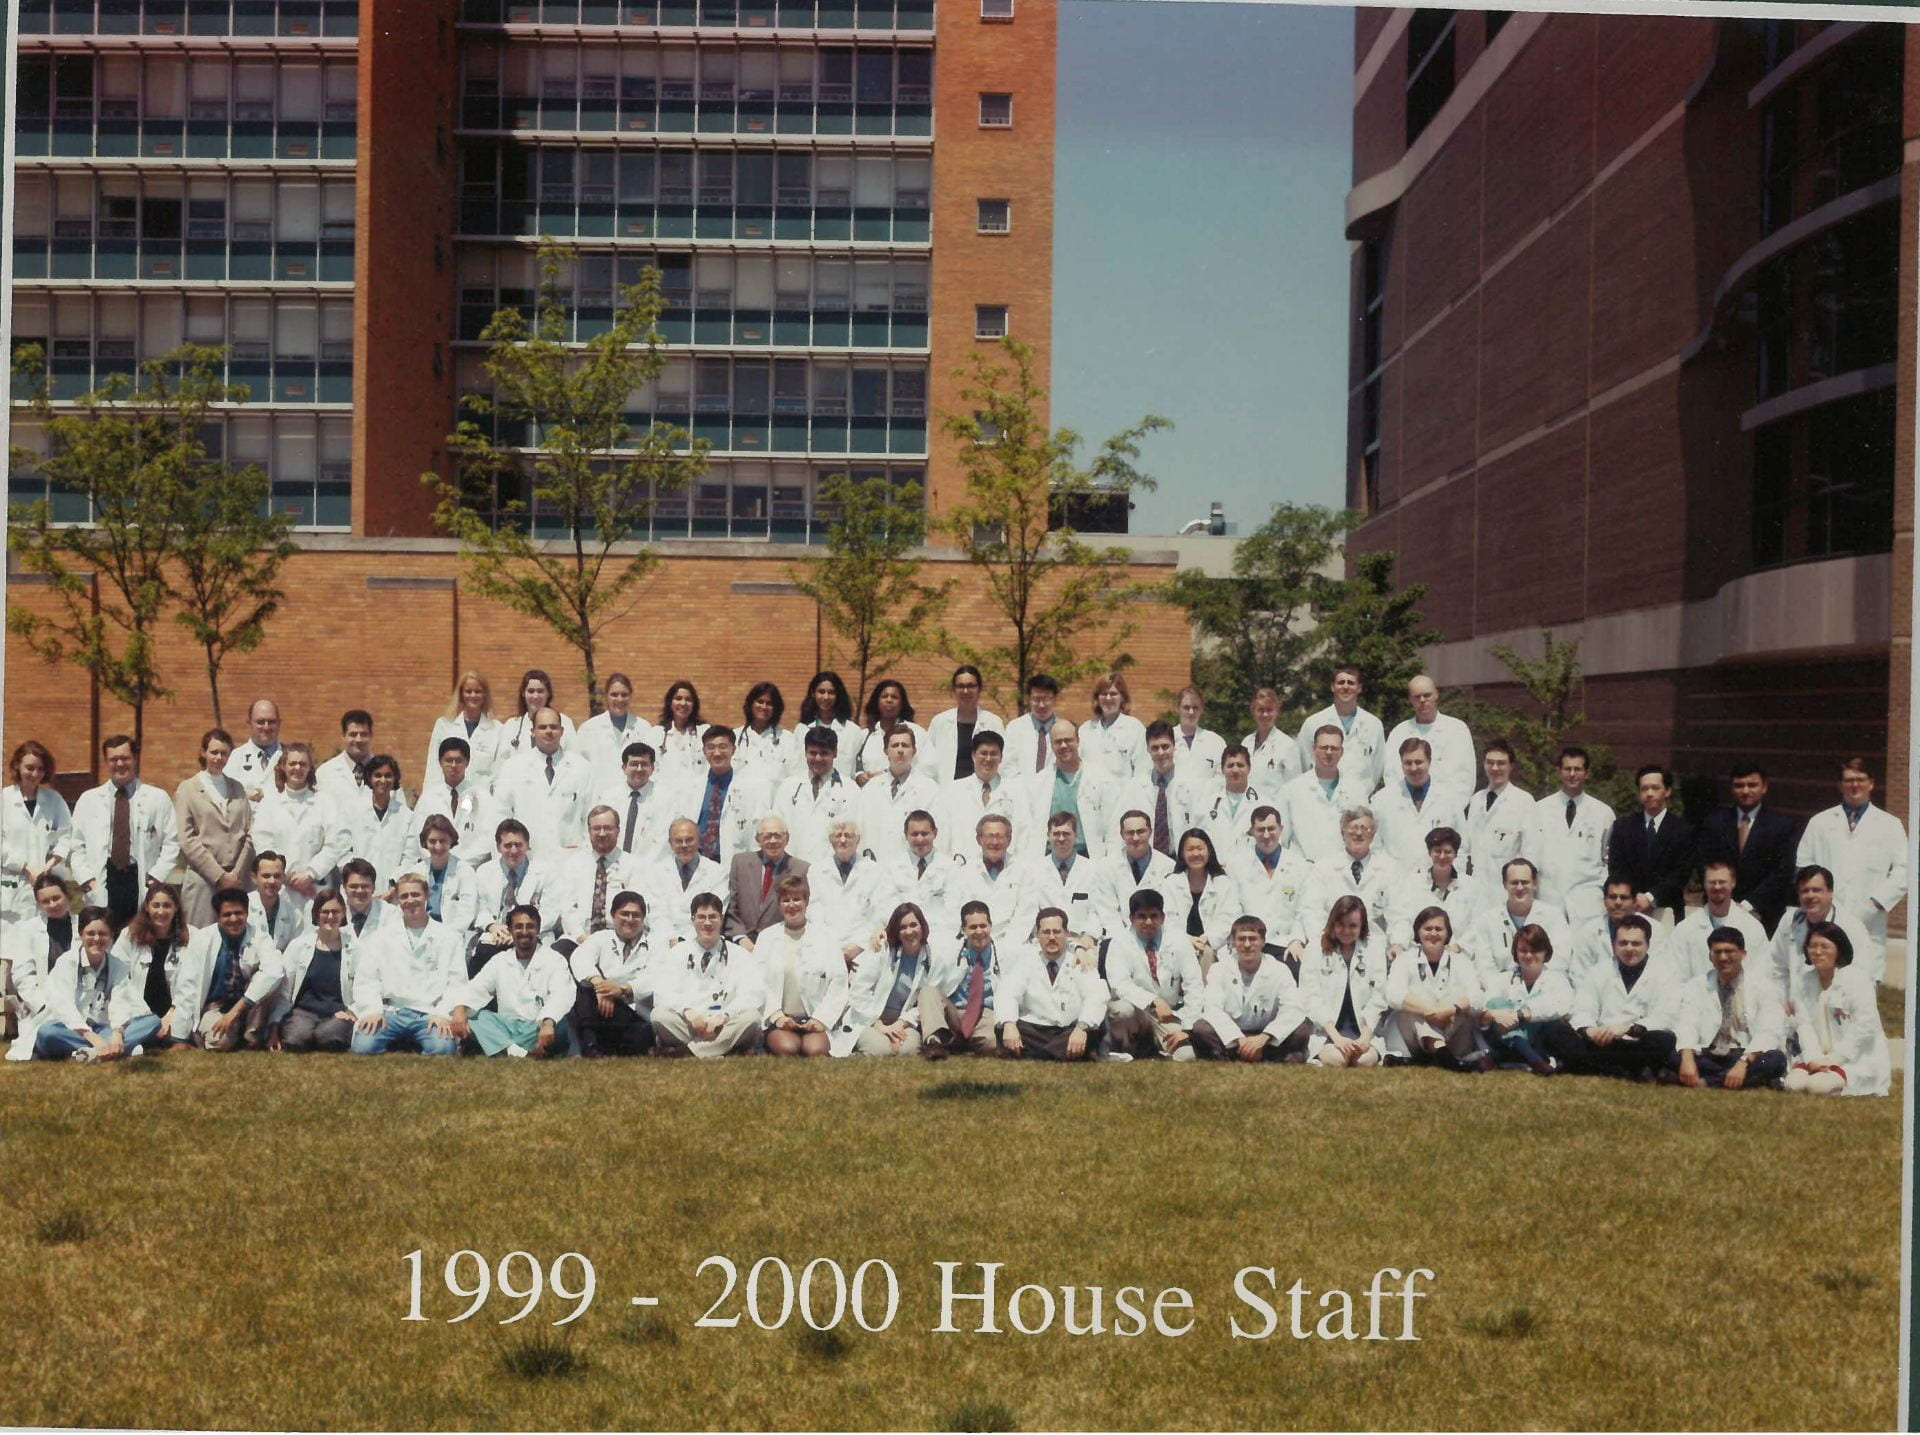 1999 Housestaff Photo